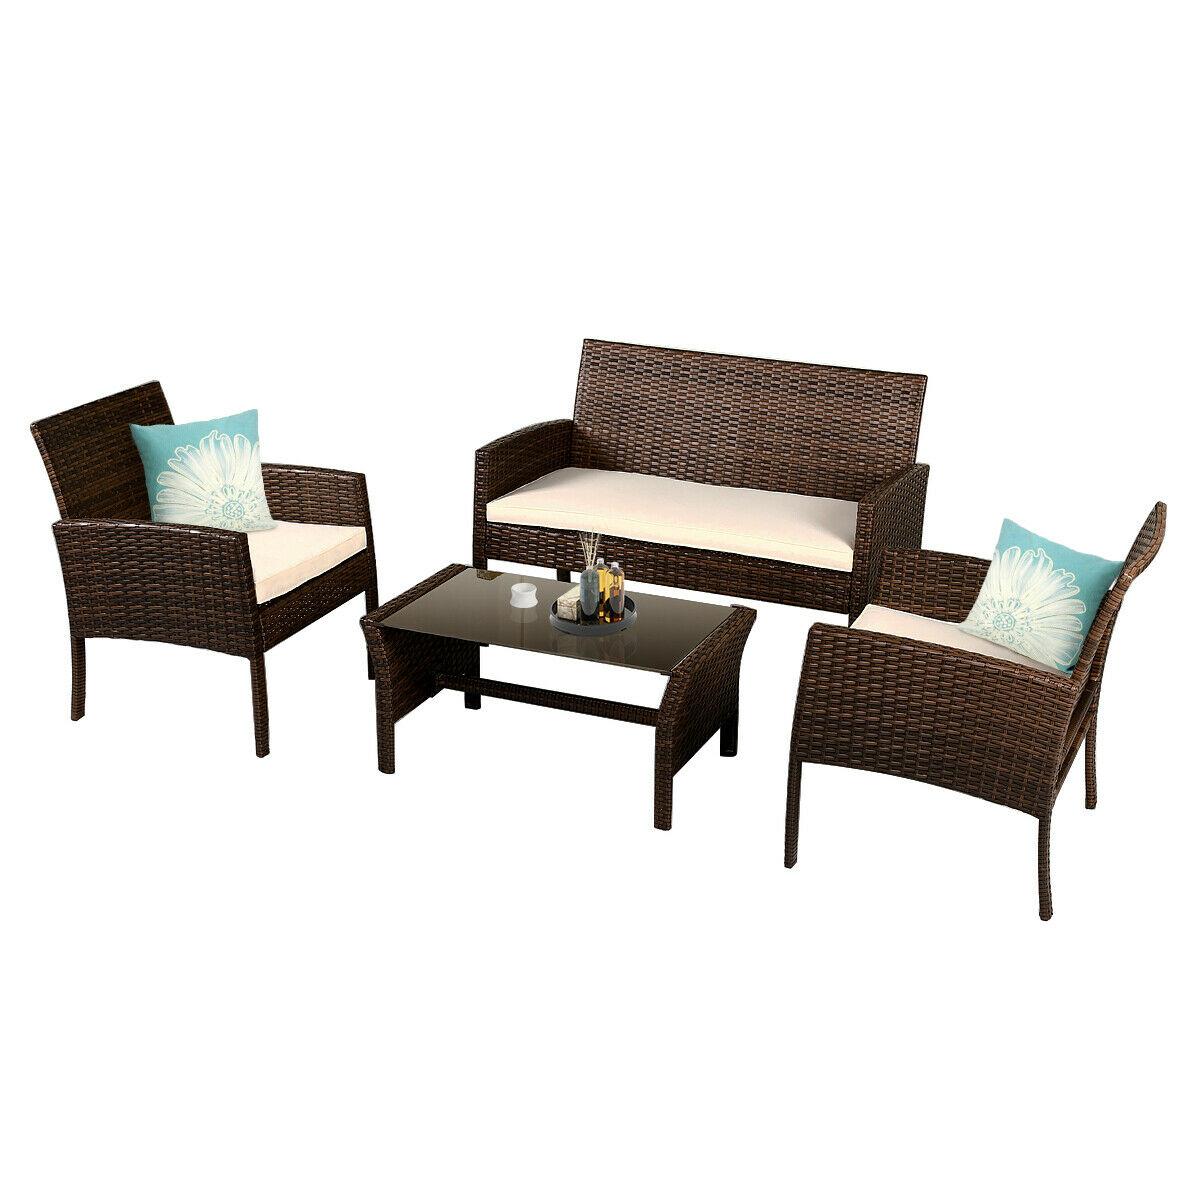 Patio Furniture Wicker Rattan Sofa Set